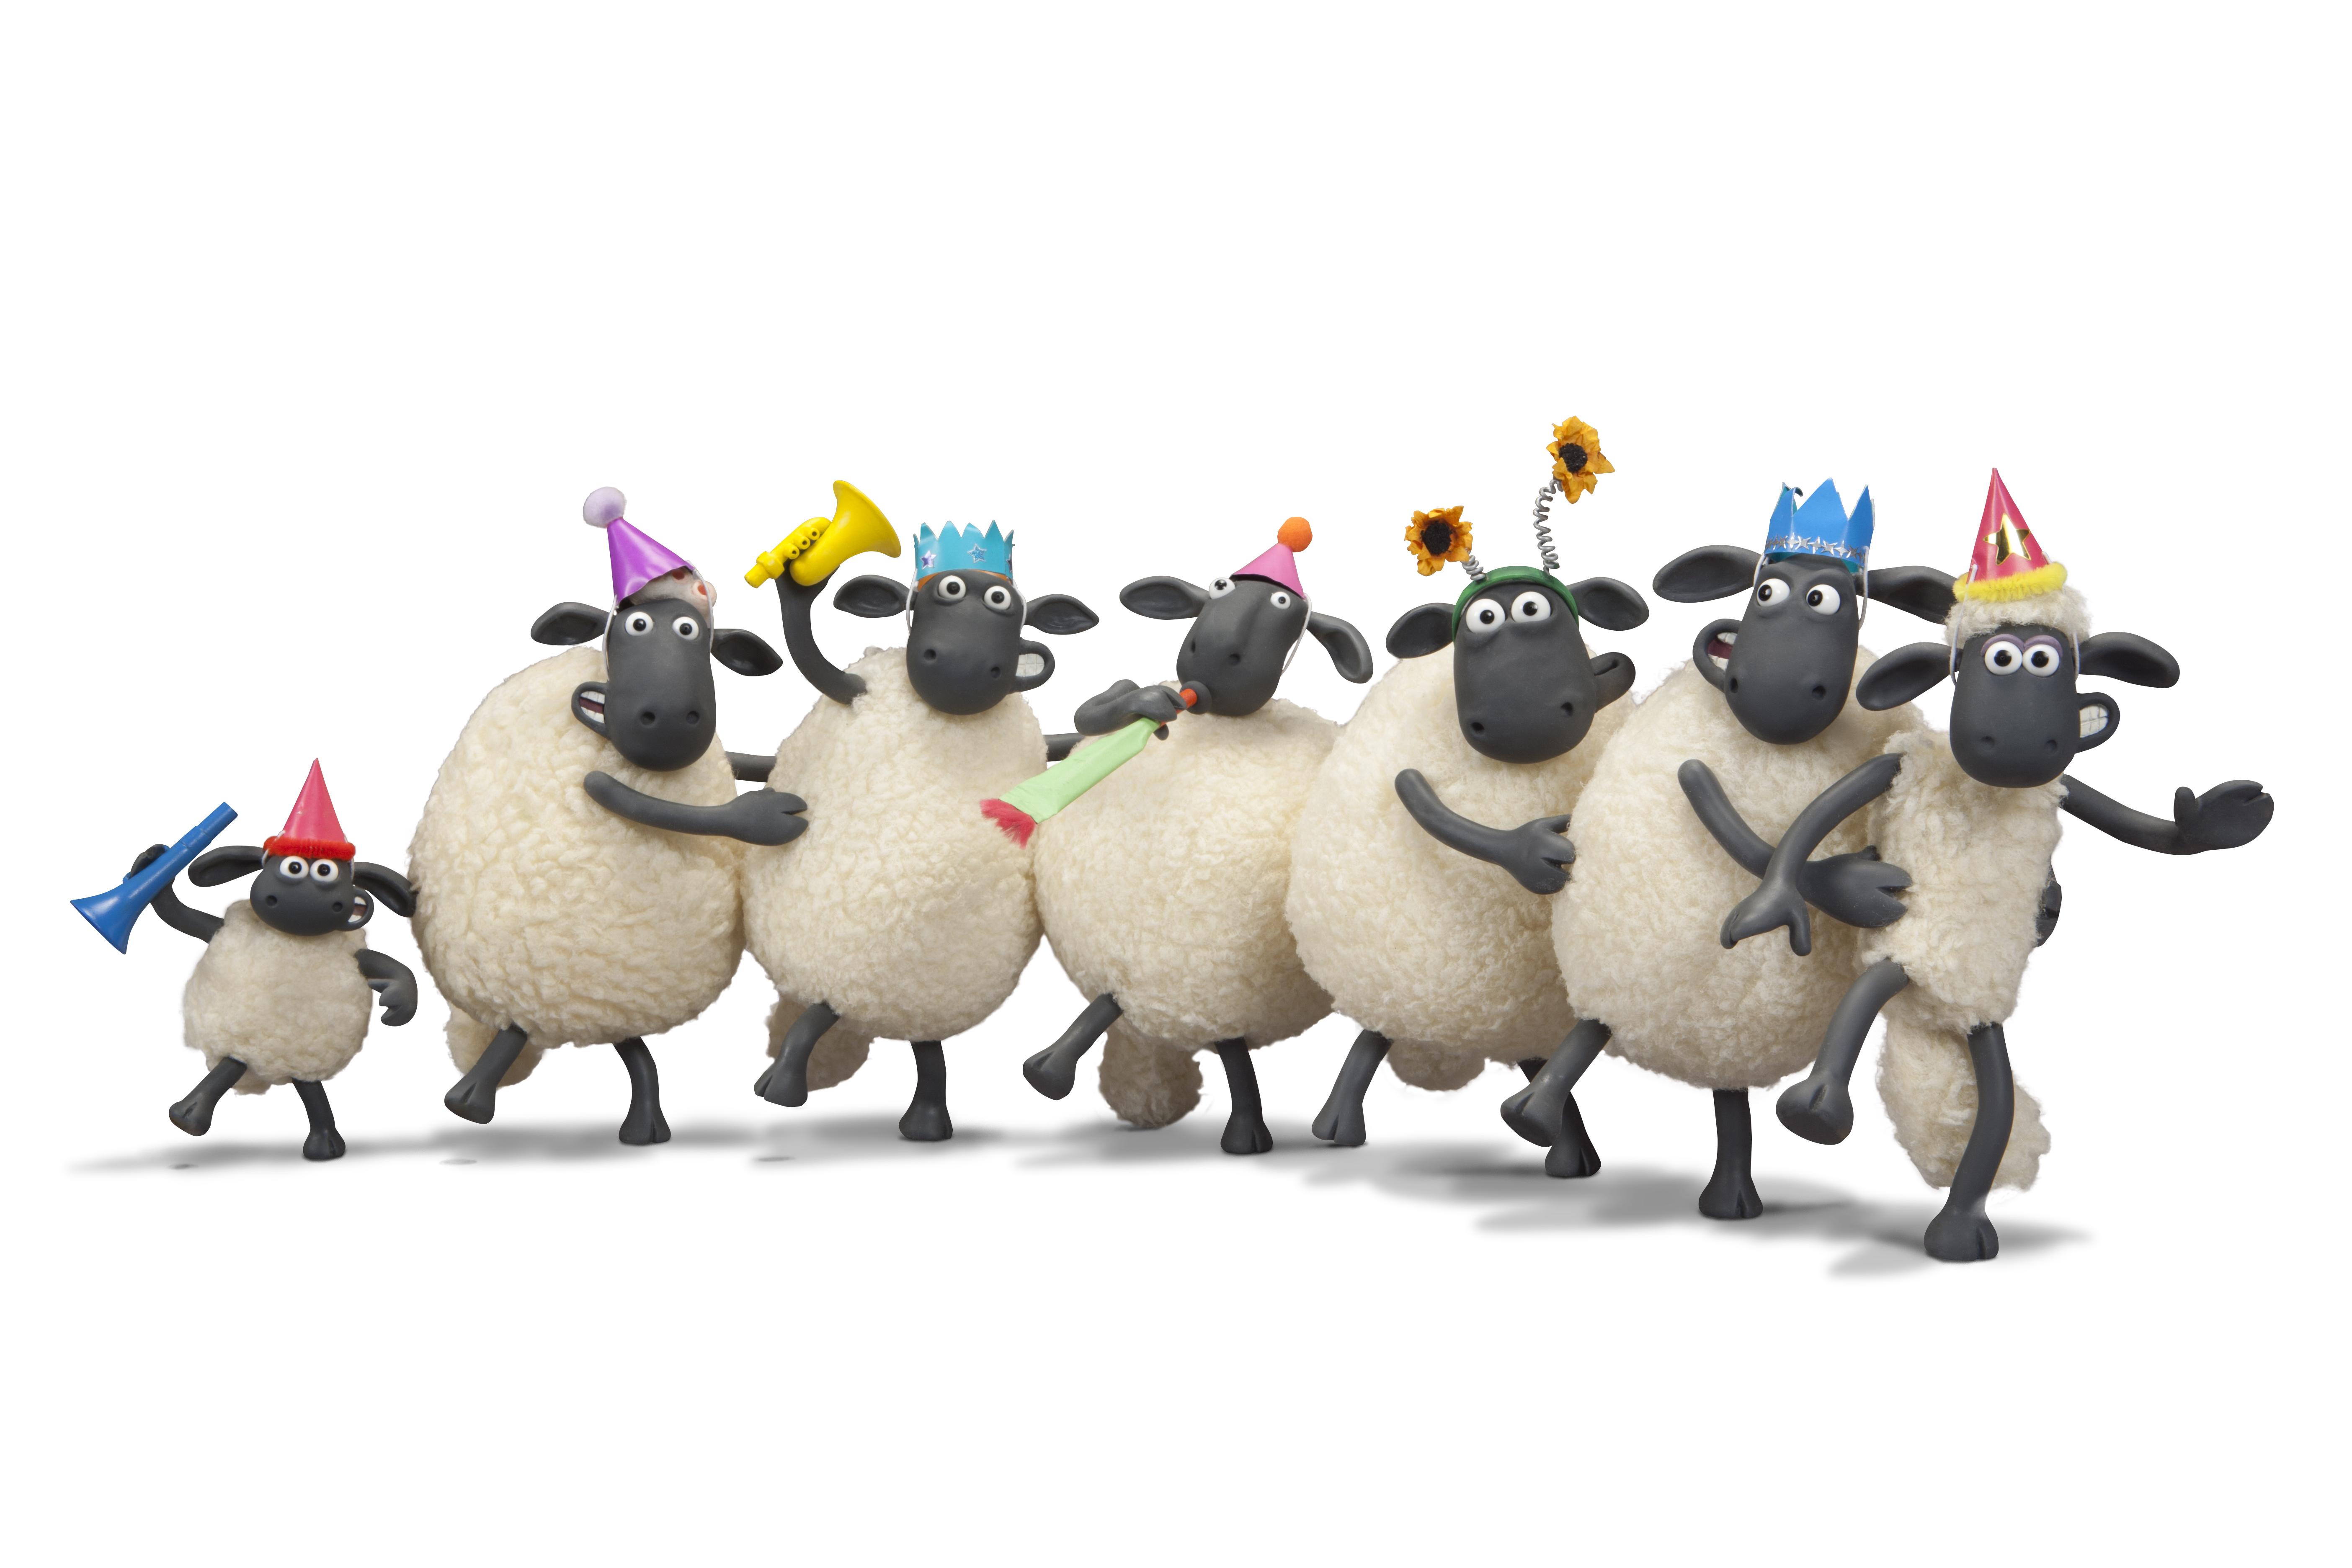 Shaun the Sheep Toys : 年賀状 テキスト : 年賀状